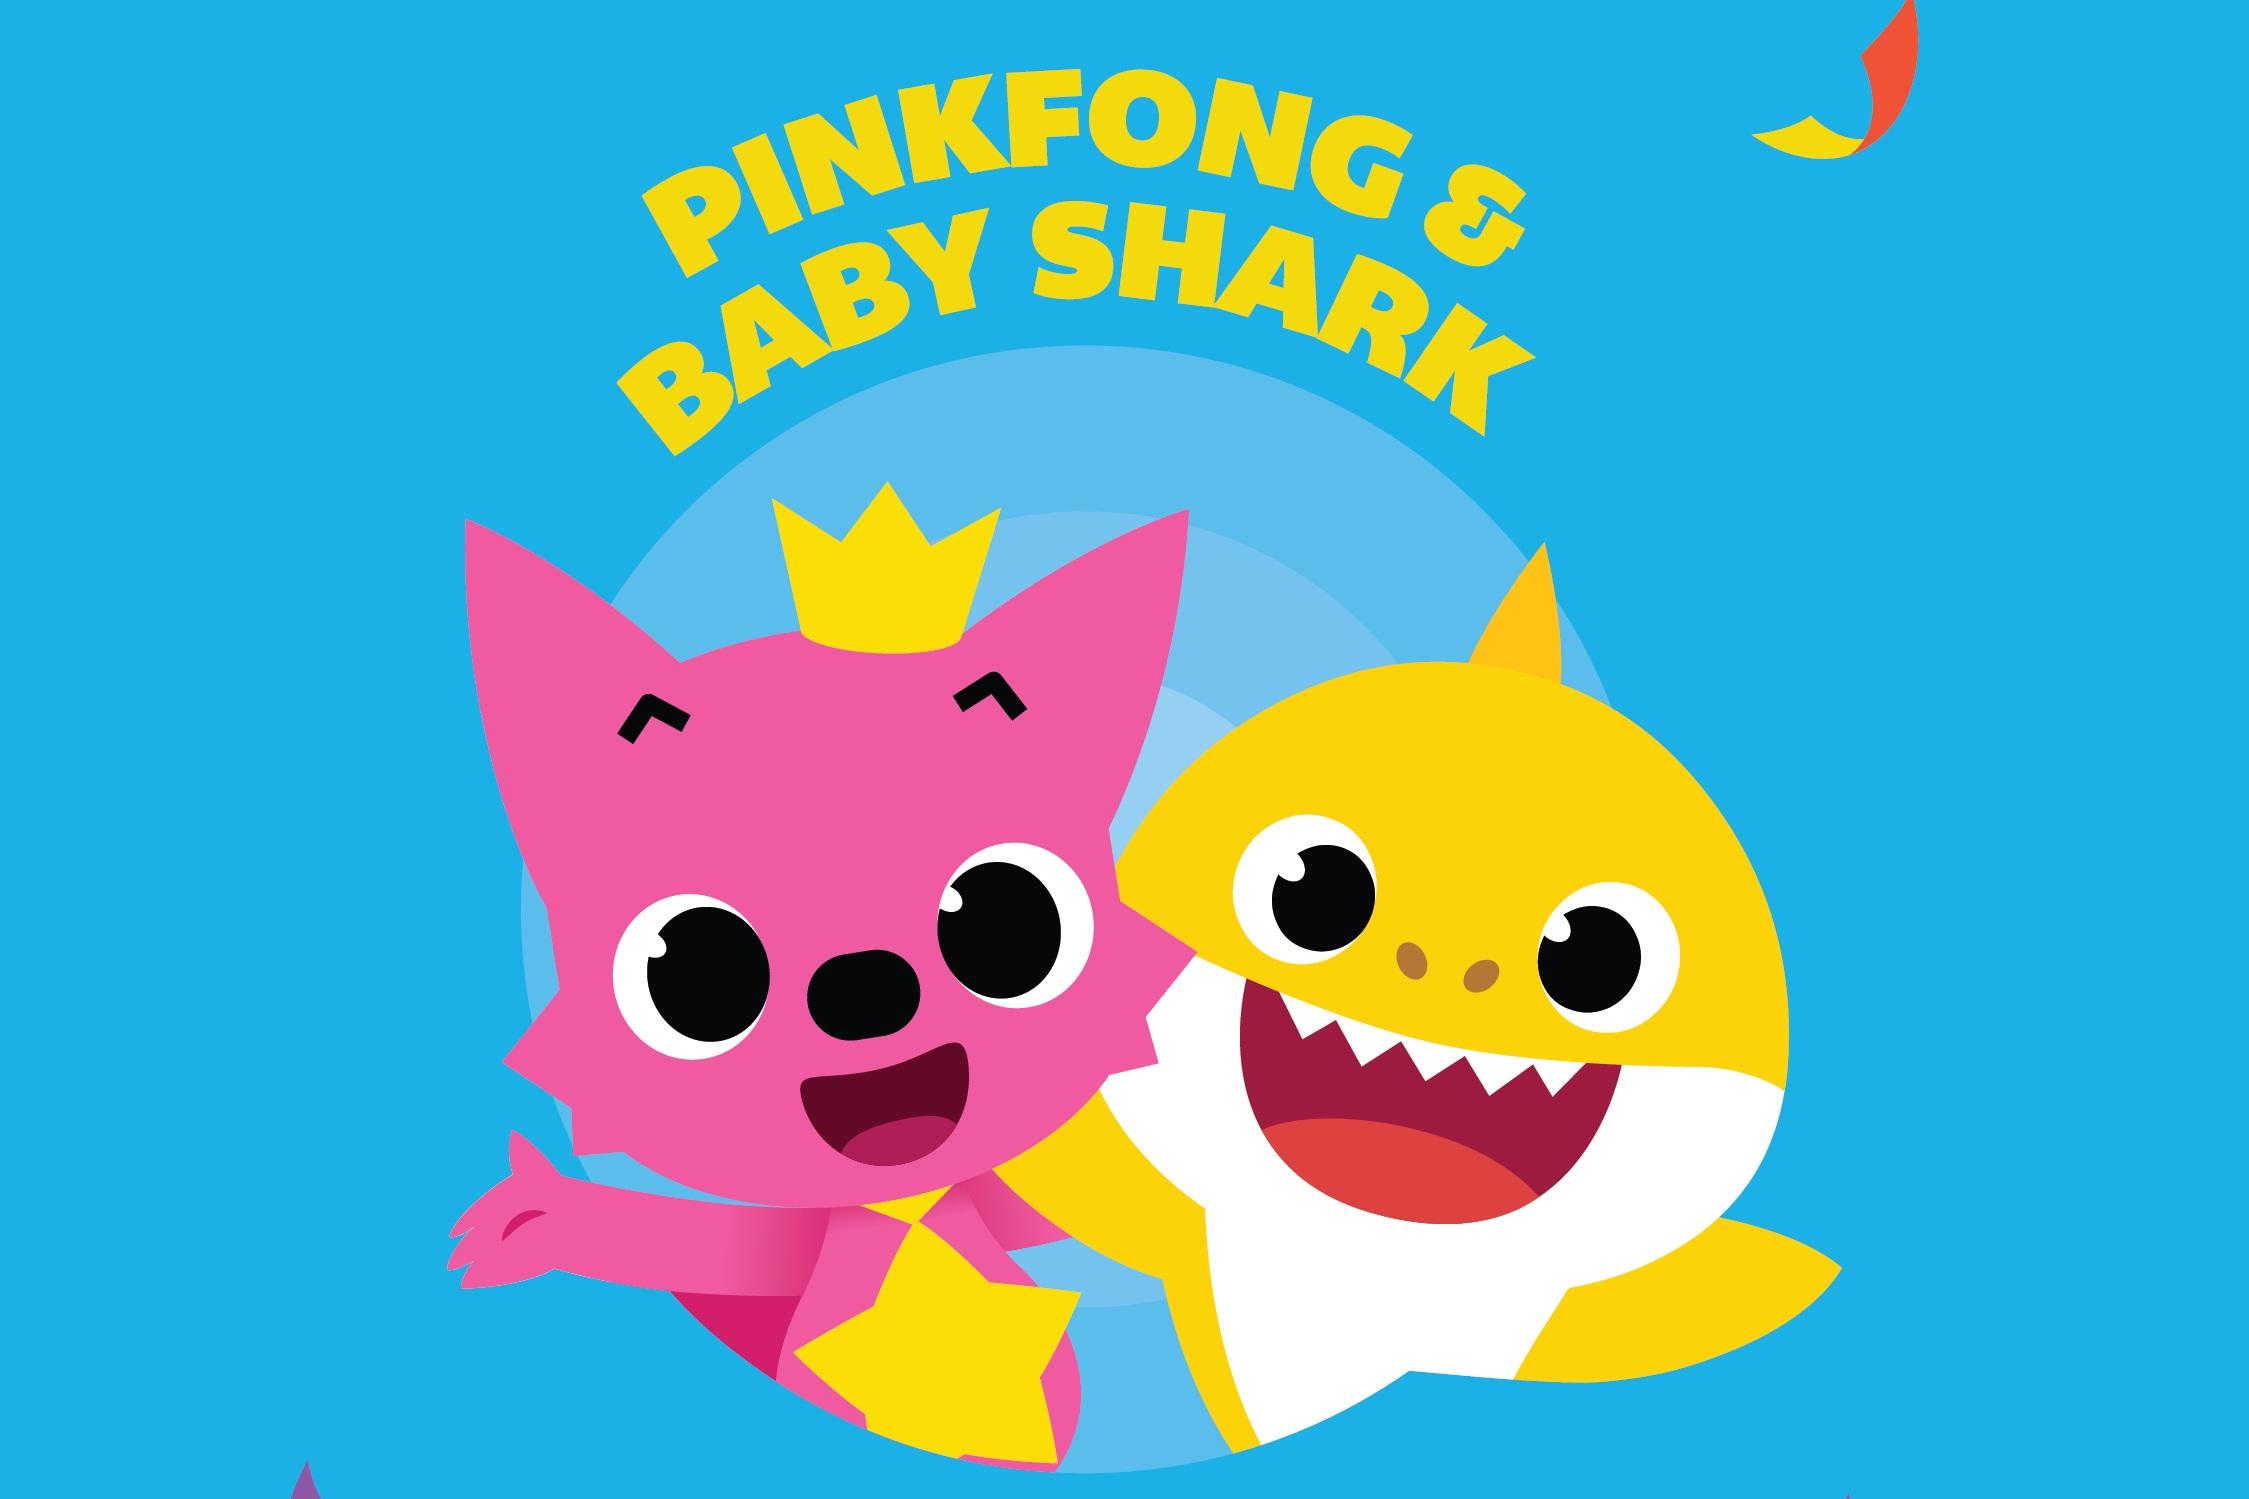 BabyShark+Character+Iso+%281%29.jpg